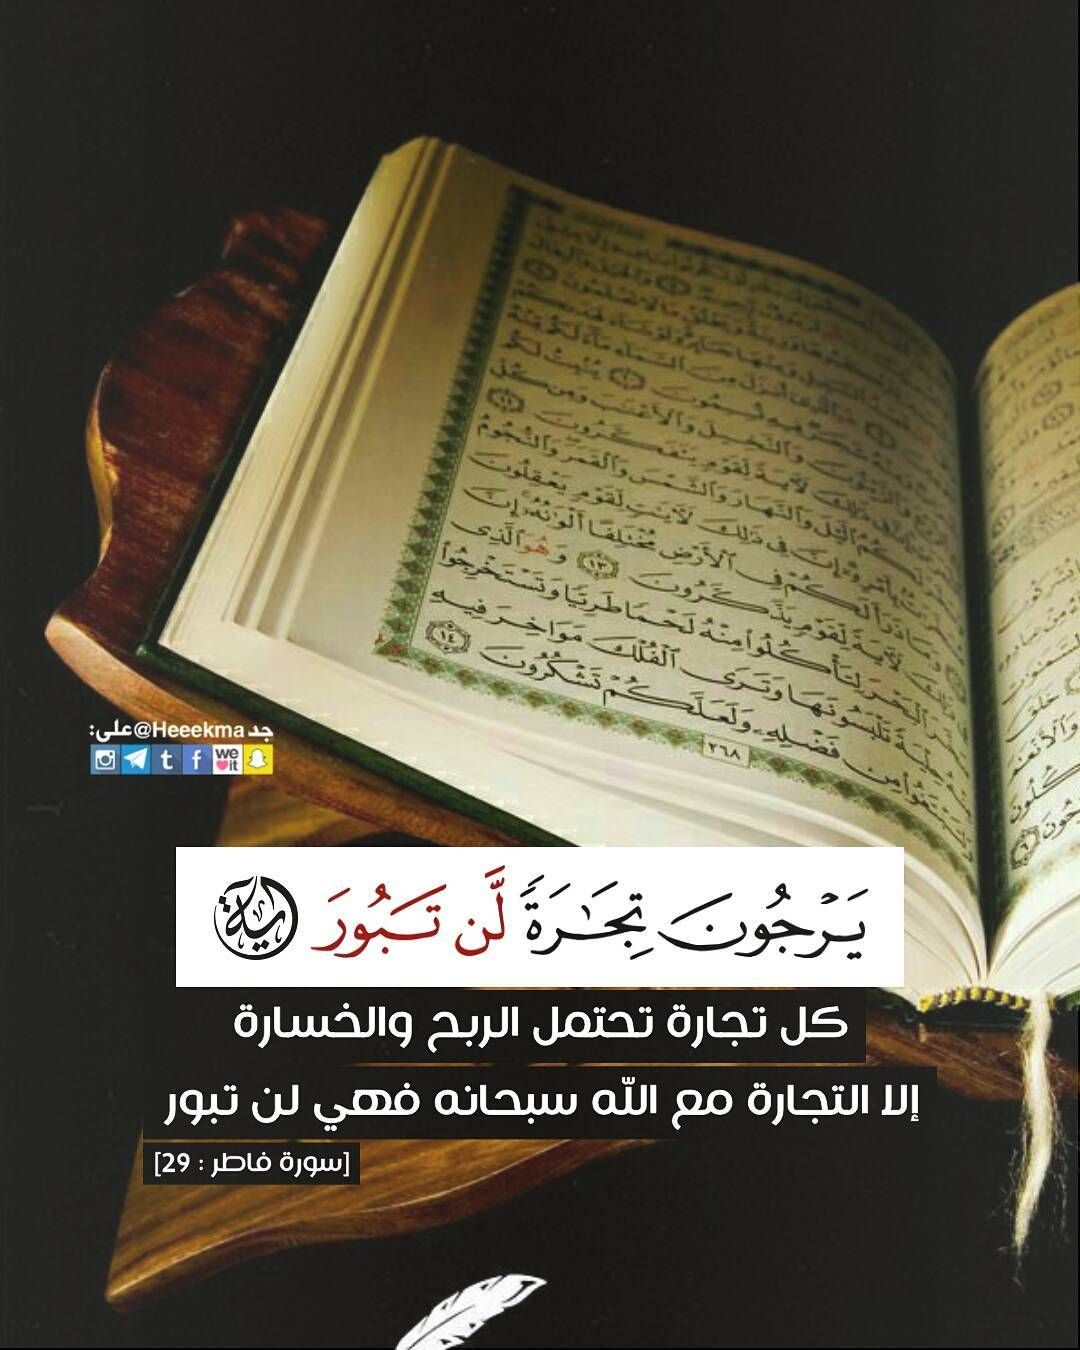 1 382 Likes 25 Comments آية و حكمة في صورة Heeekma On Instagram Quot و ل ت ص ن ع ع ل ى ع ي ن ي Quot قا Grilling Gifts Quran Quotes Holy Quran